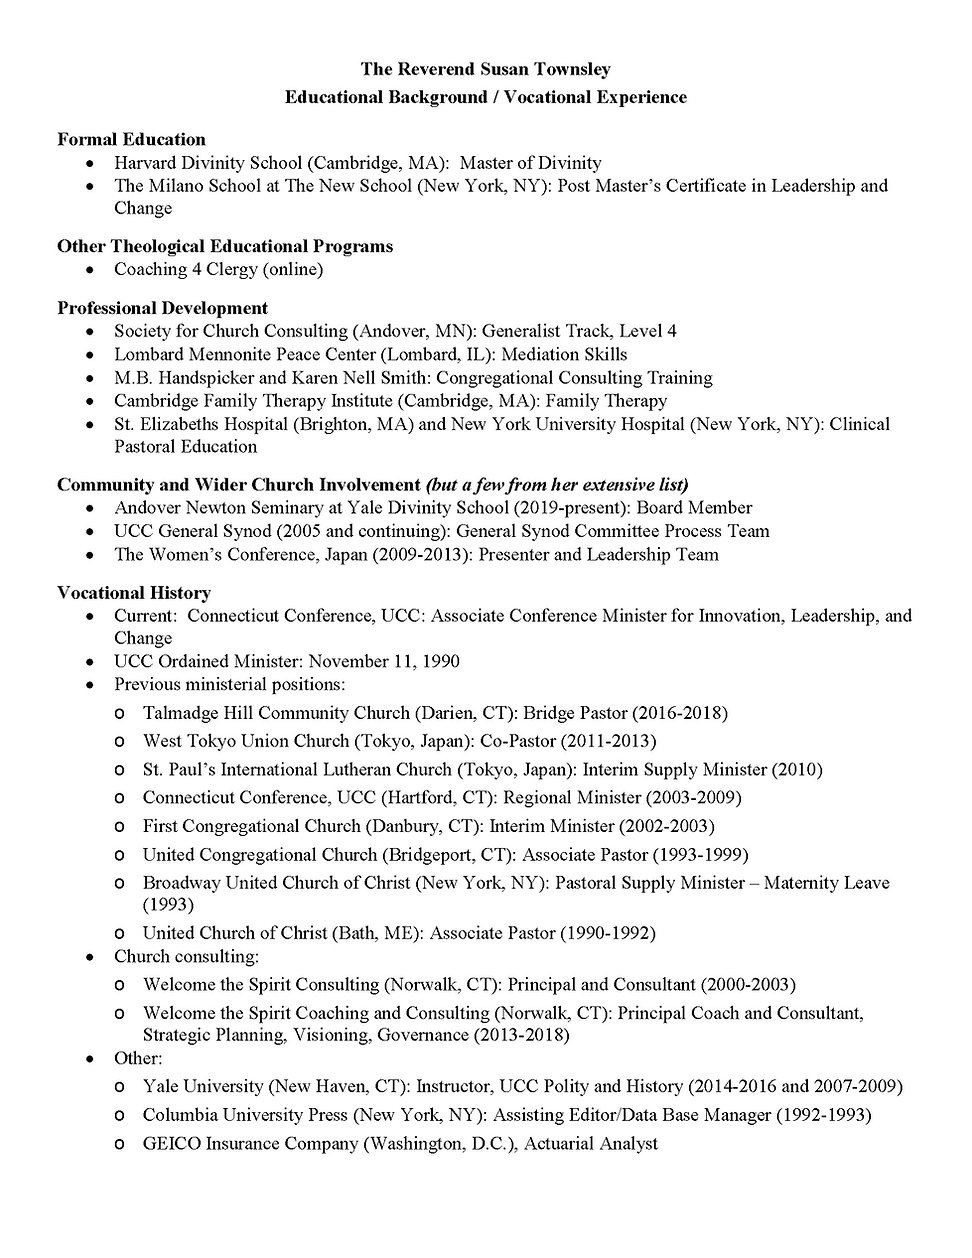 Educational new - Vocational summary - F